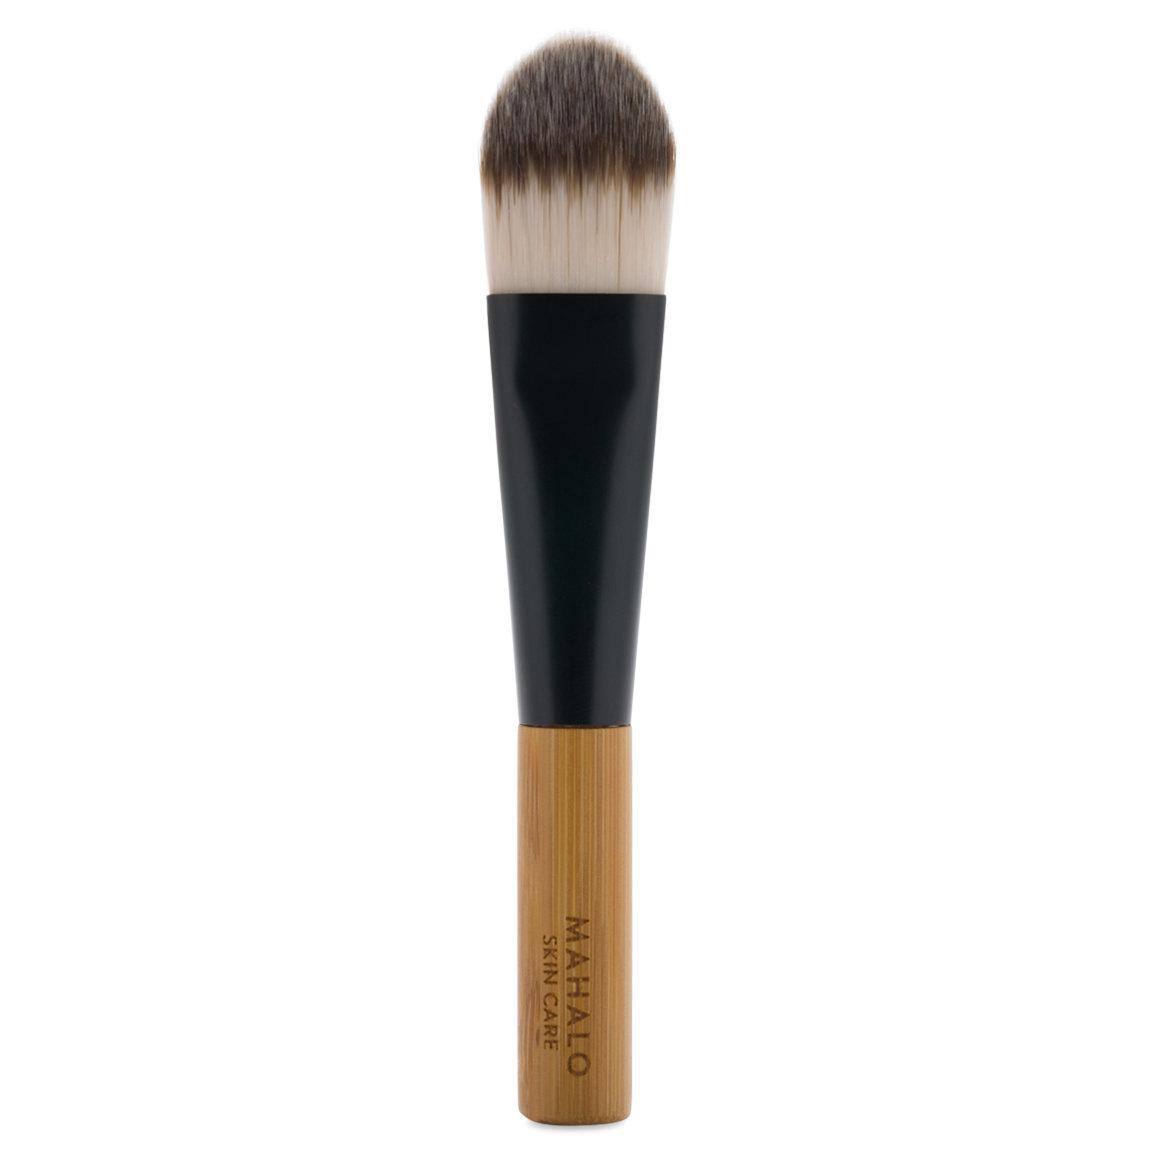 MAHALO Skin Care The Vegan Treatment Brush product swatch.